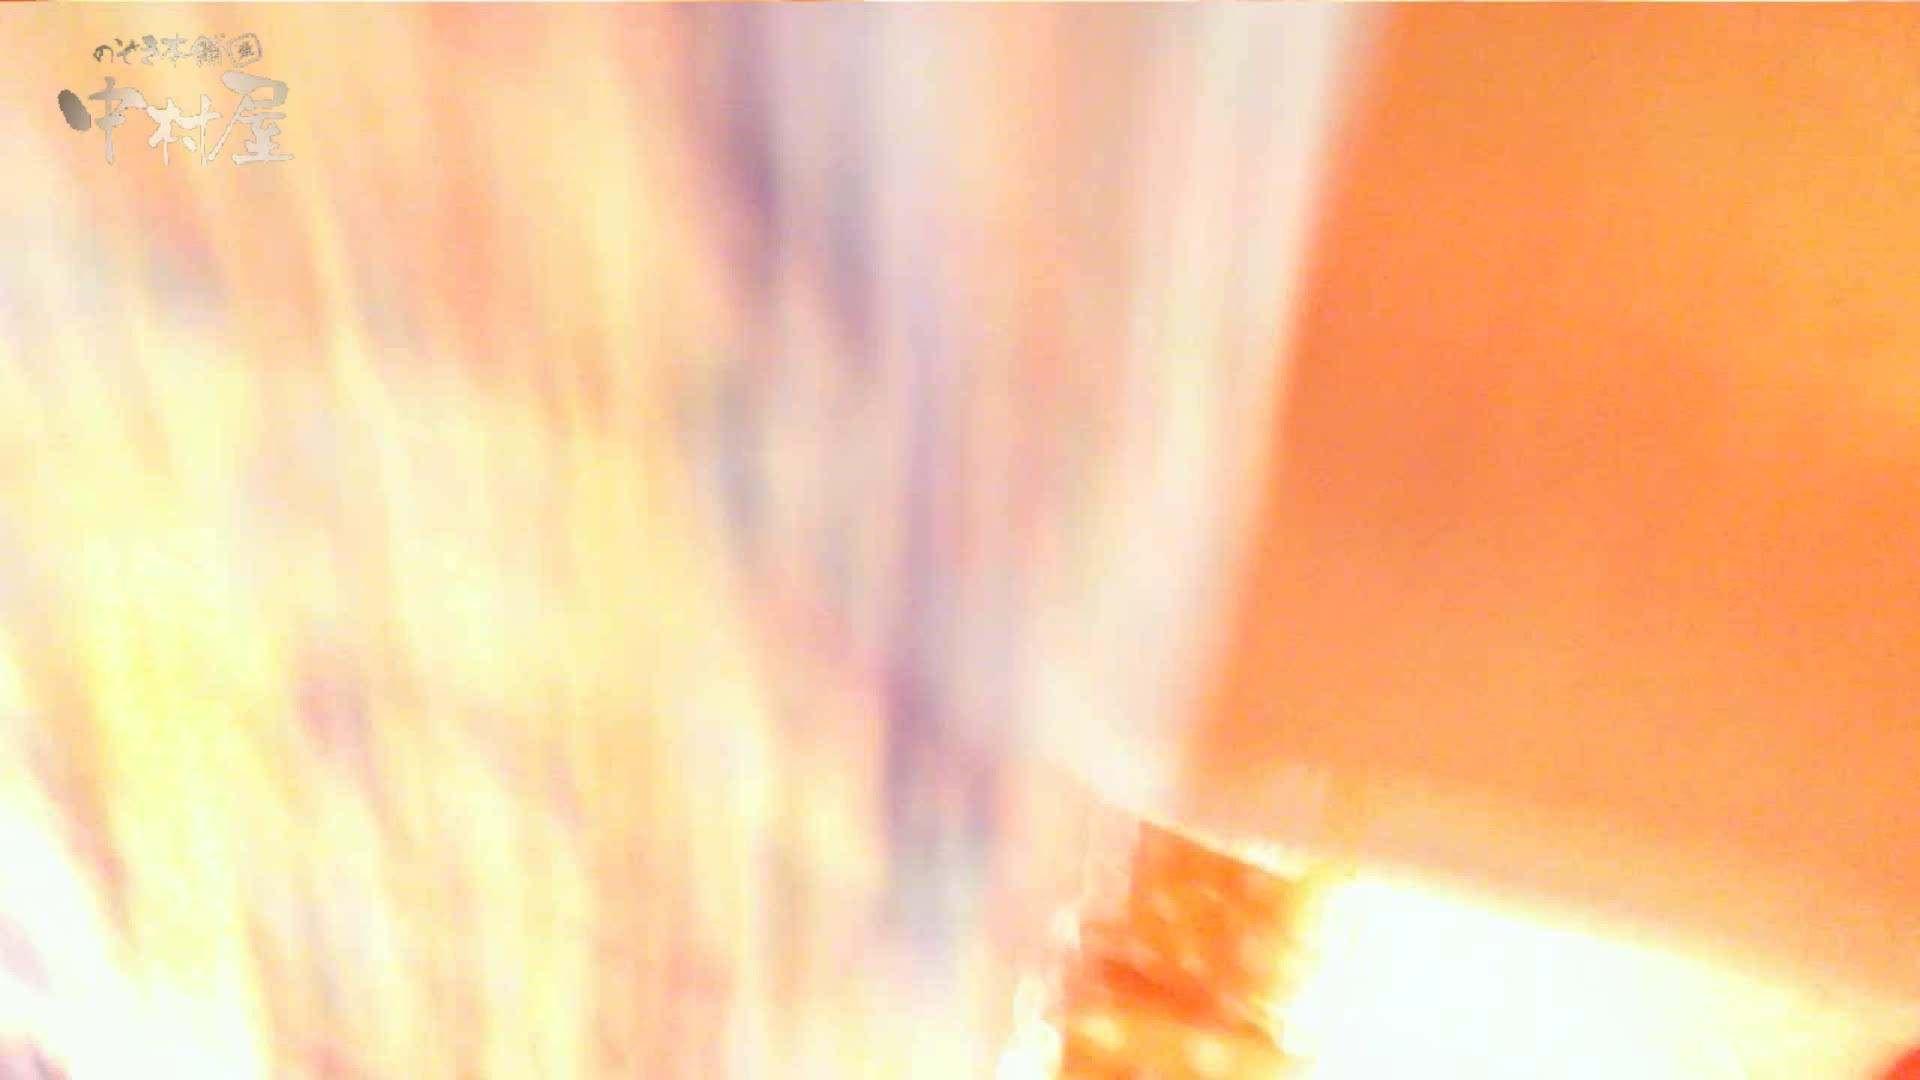 vol.69 美人アパレル胸チラ&パンチラ ストライプパンツみっけ! 接写 盗撮動画紹介 112PIX 58